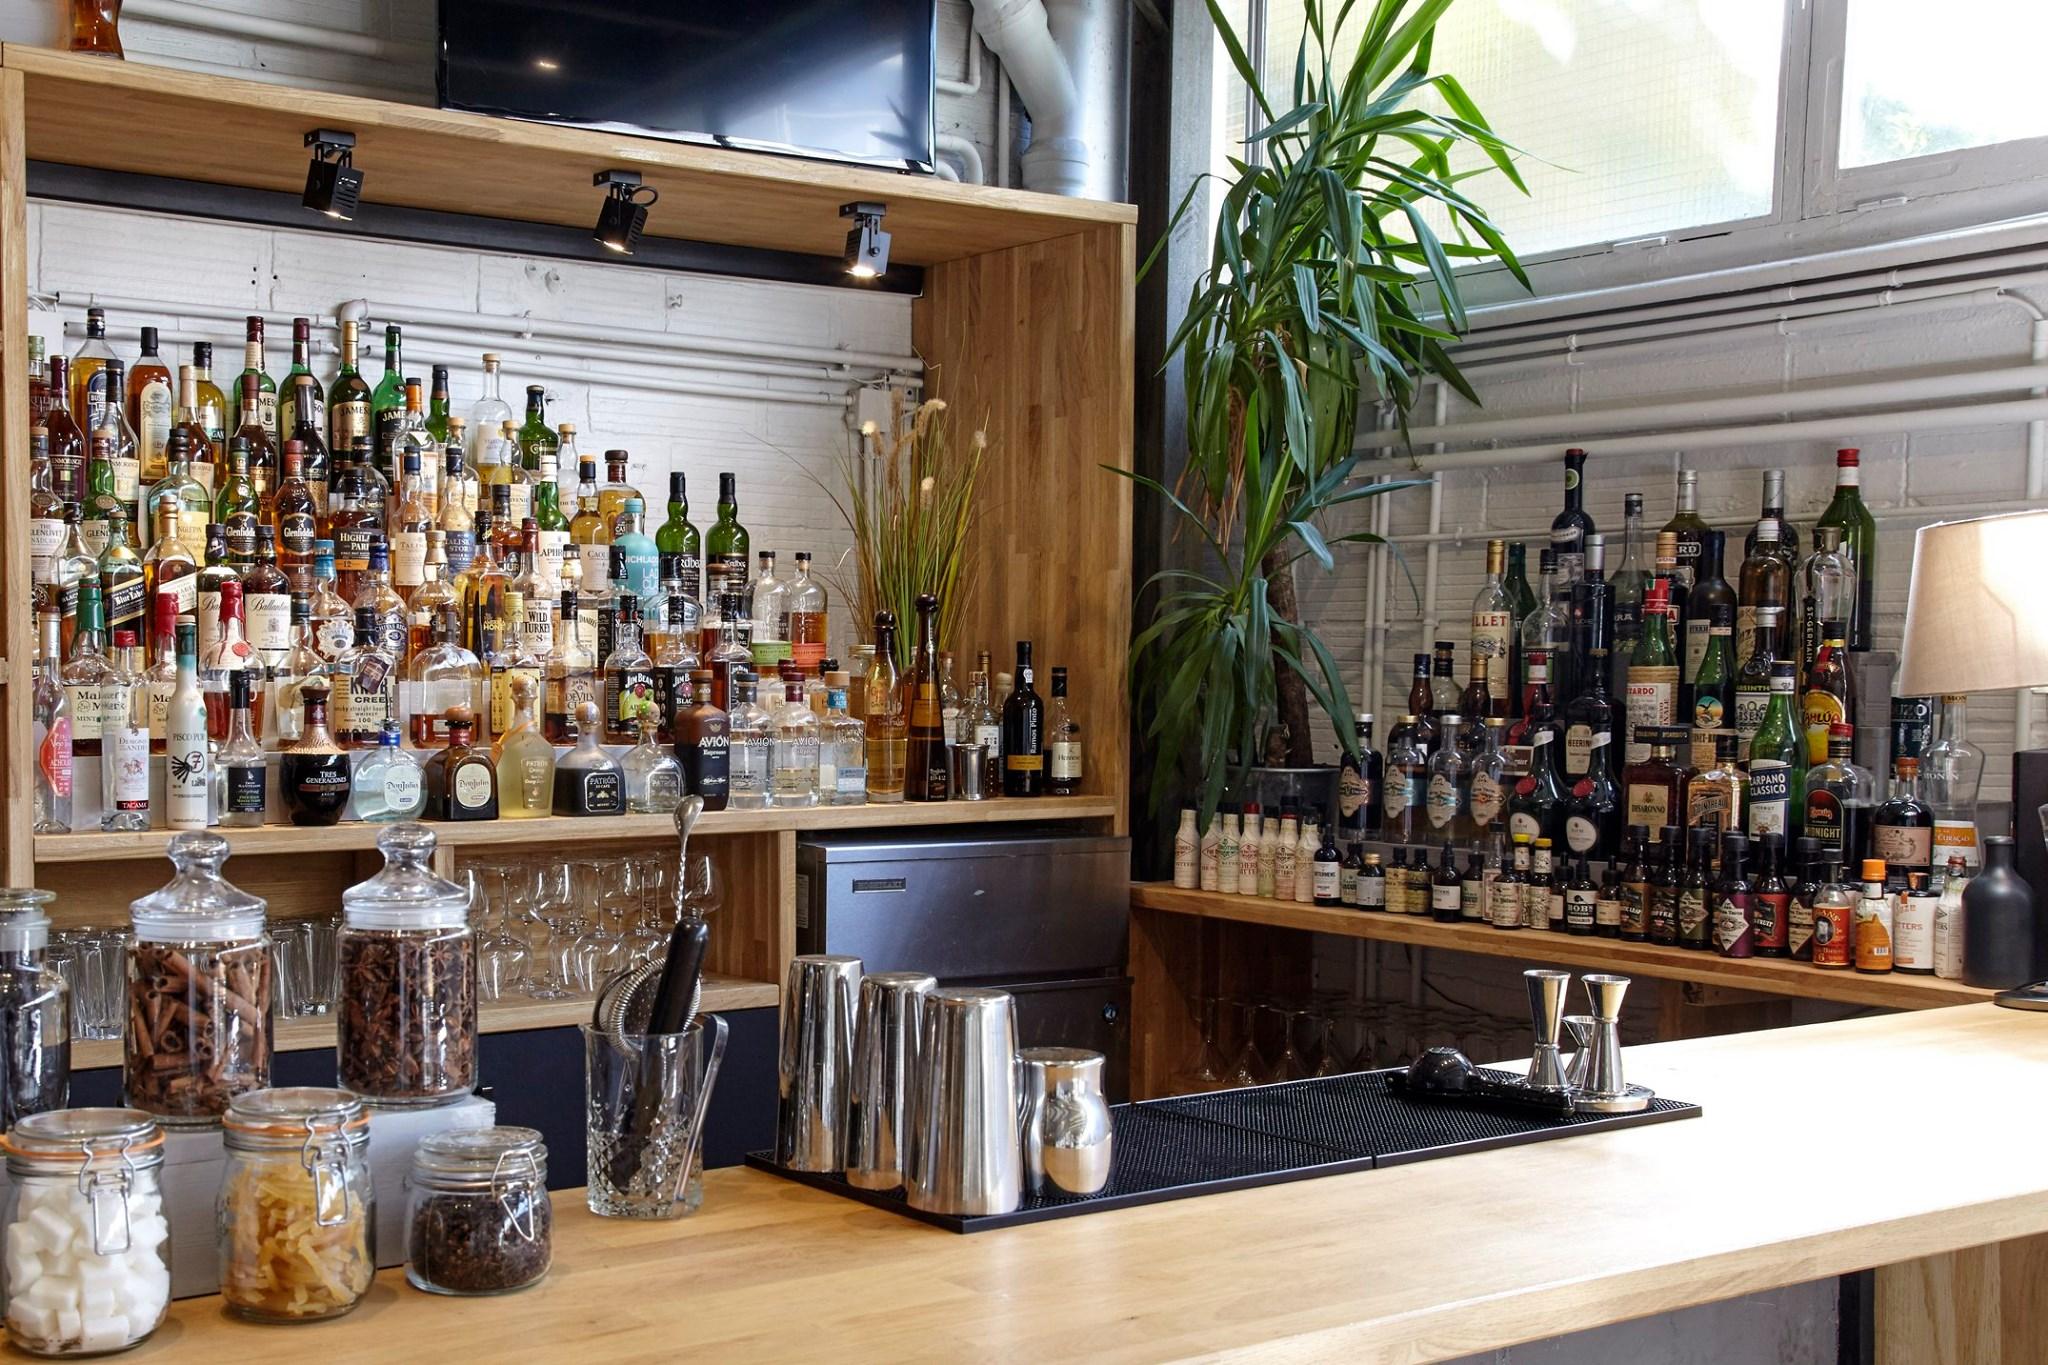 Bar Spoon - Centre de formation CQP Barman